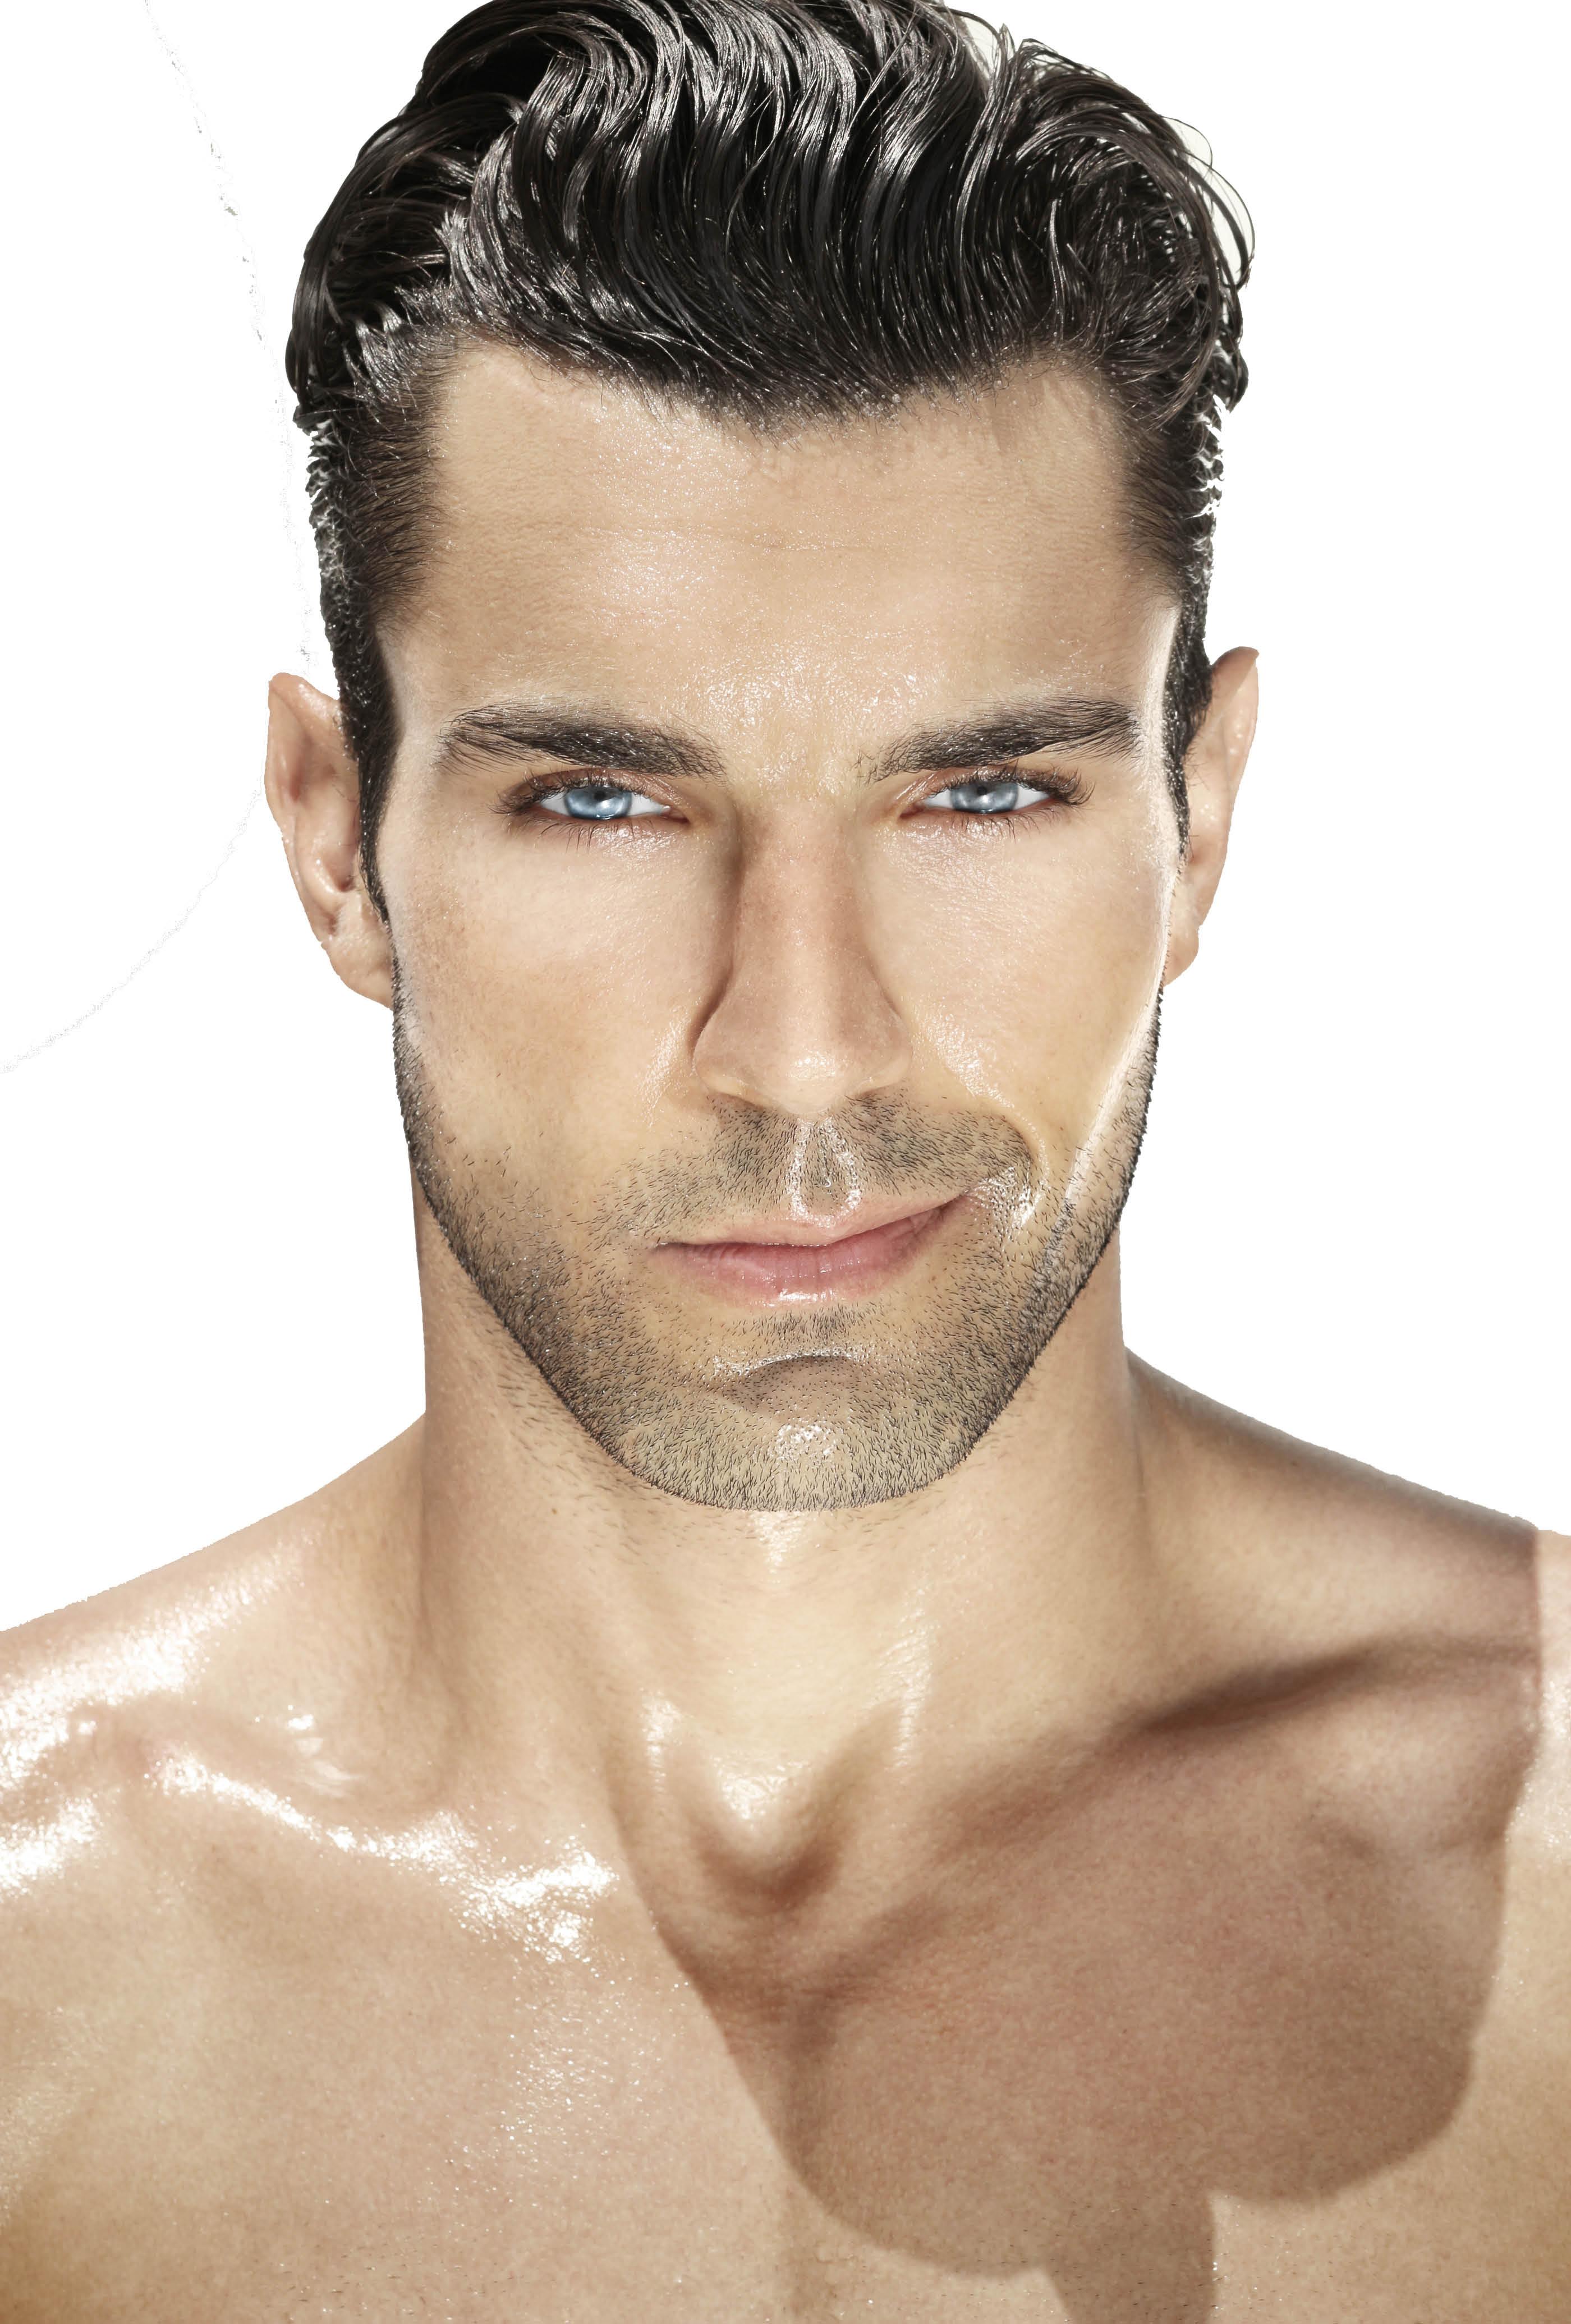 men's haircut men's hair cut mens haircuts men's hair care mens hair care organic men's hair products men's haircut coupons men's hair cut coupon